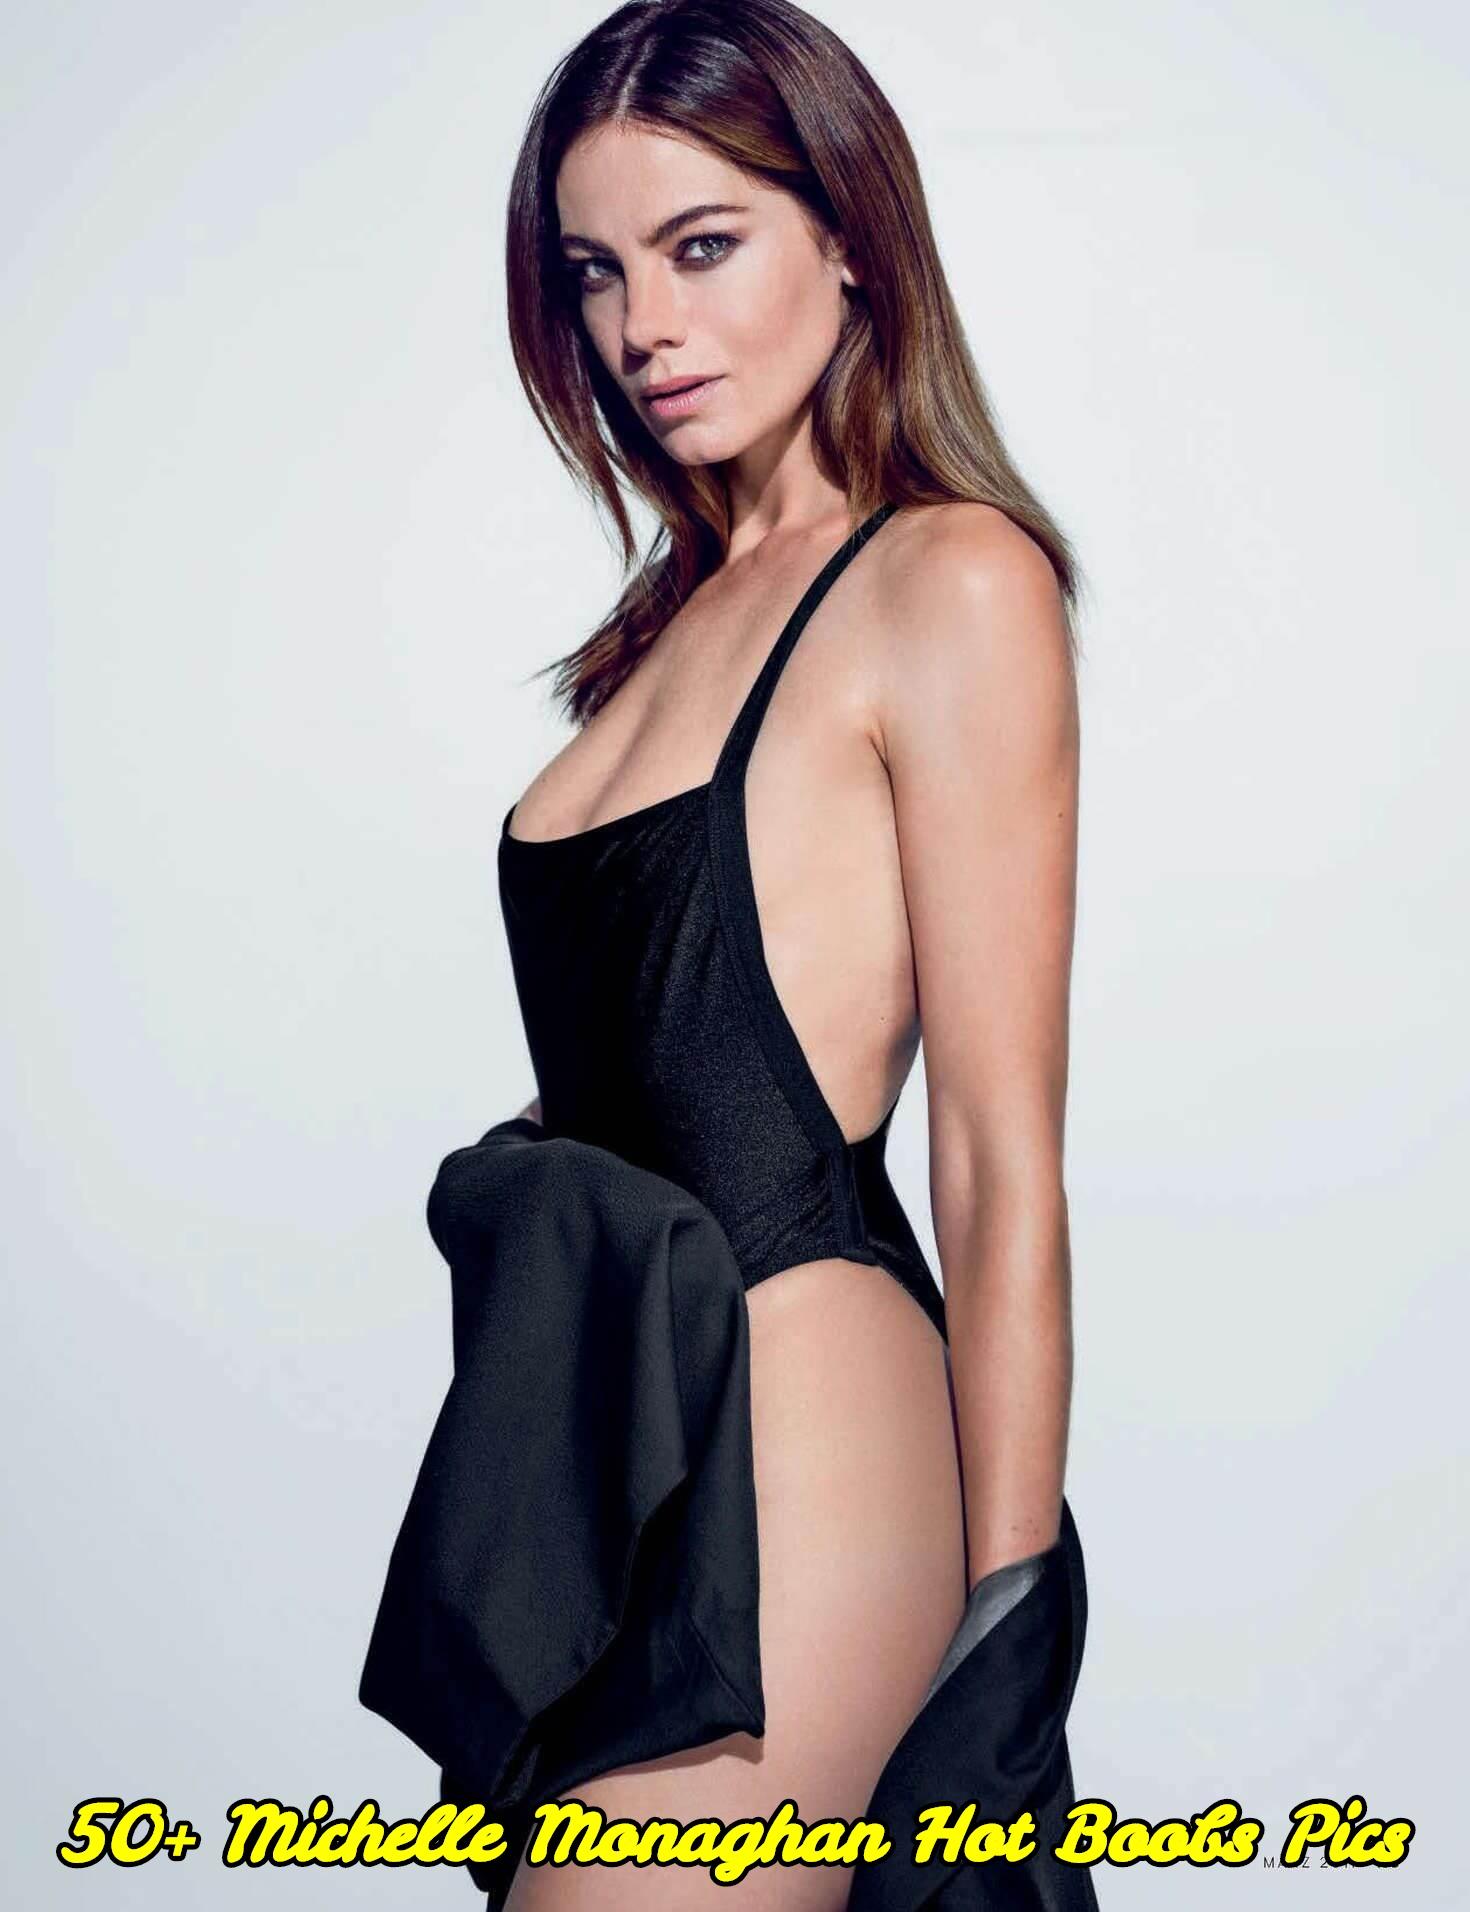 Michelle Monaghan hot boobs pics